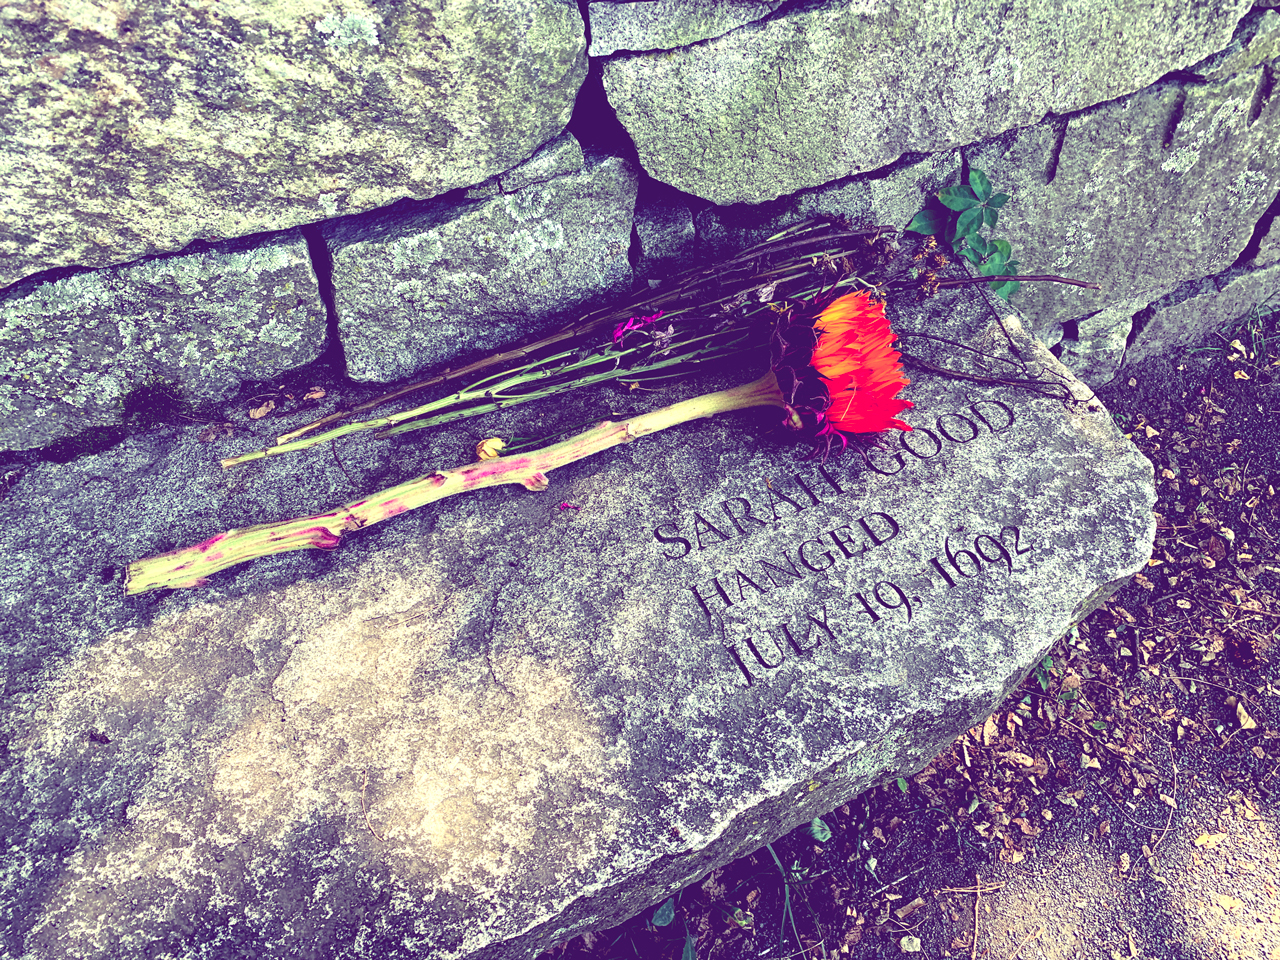 salem-witch-trials-memorial-massachusetts-sarah-good-1280x960